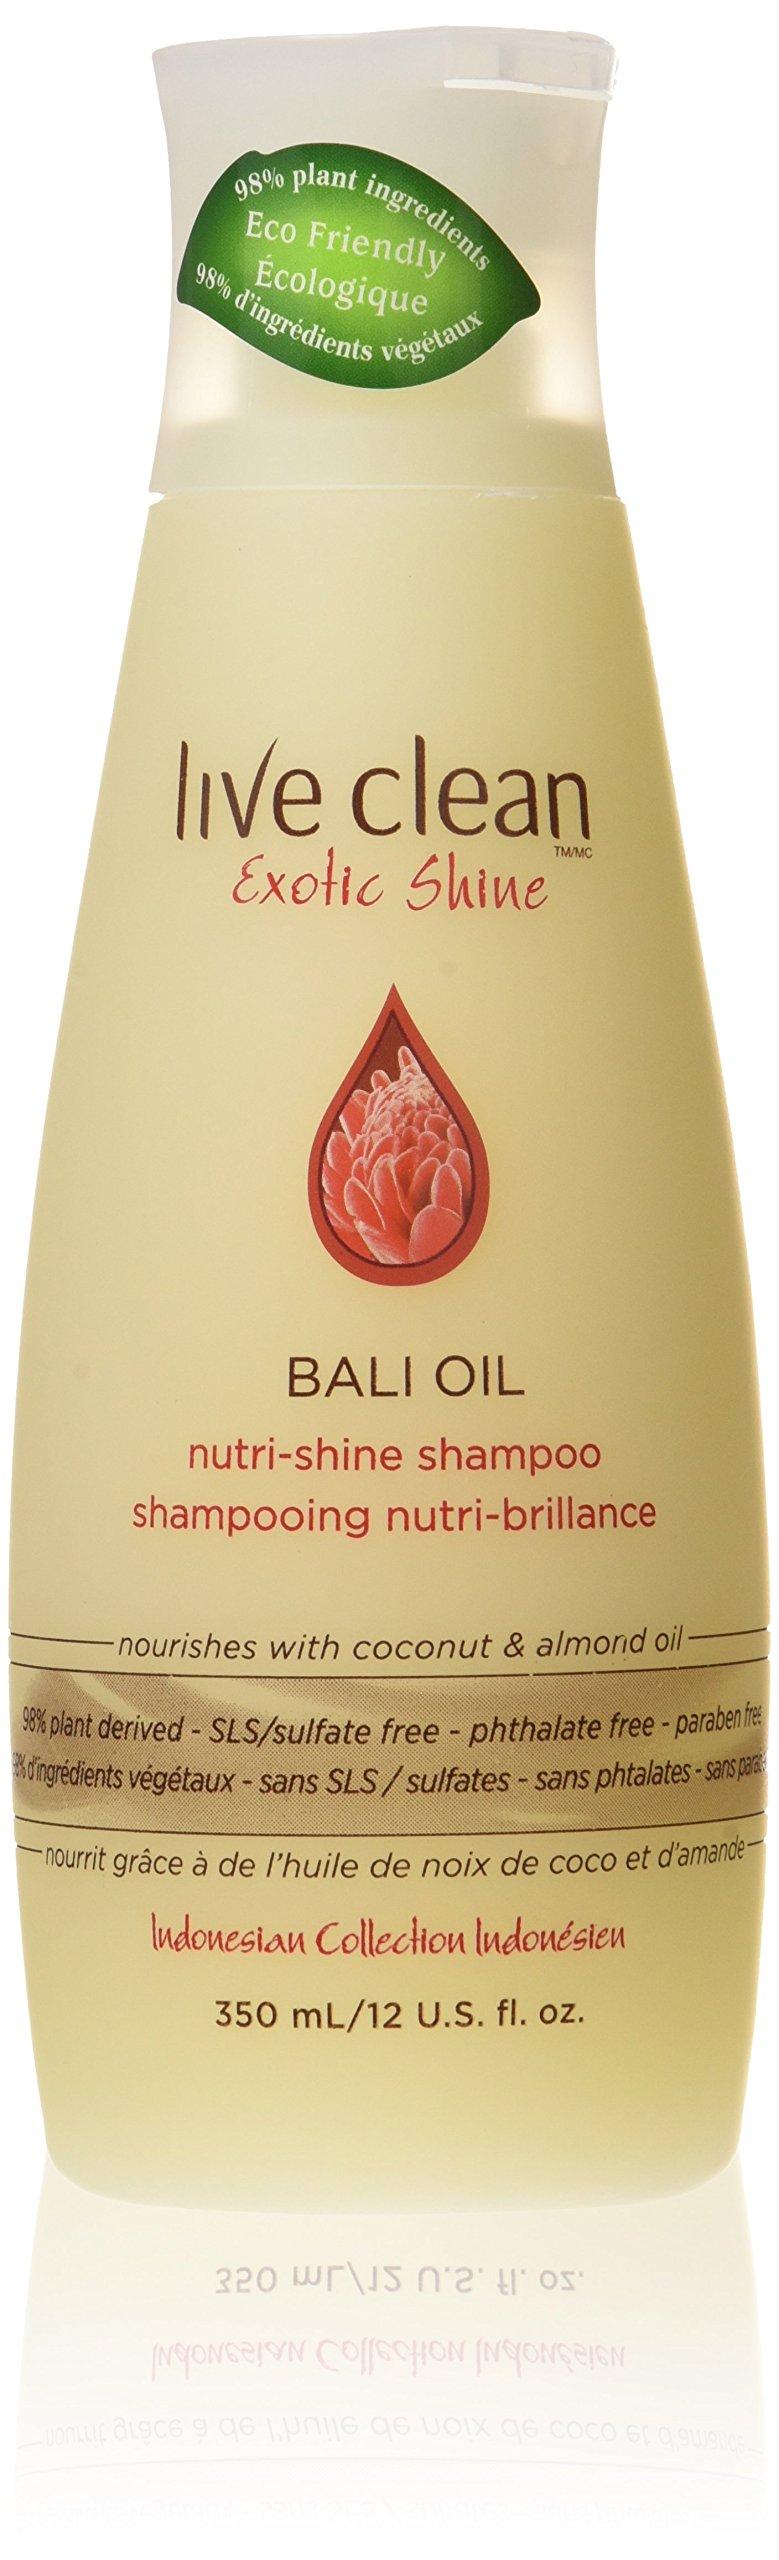 Live Clean Bali Oil nutri-shine shampoo, 350ml